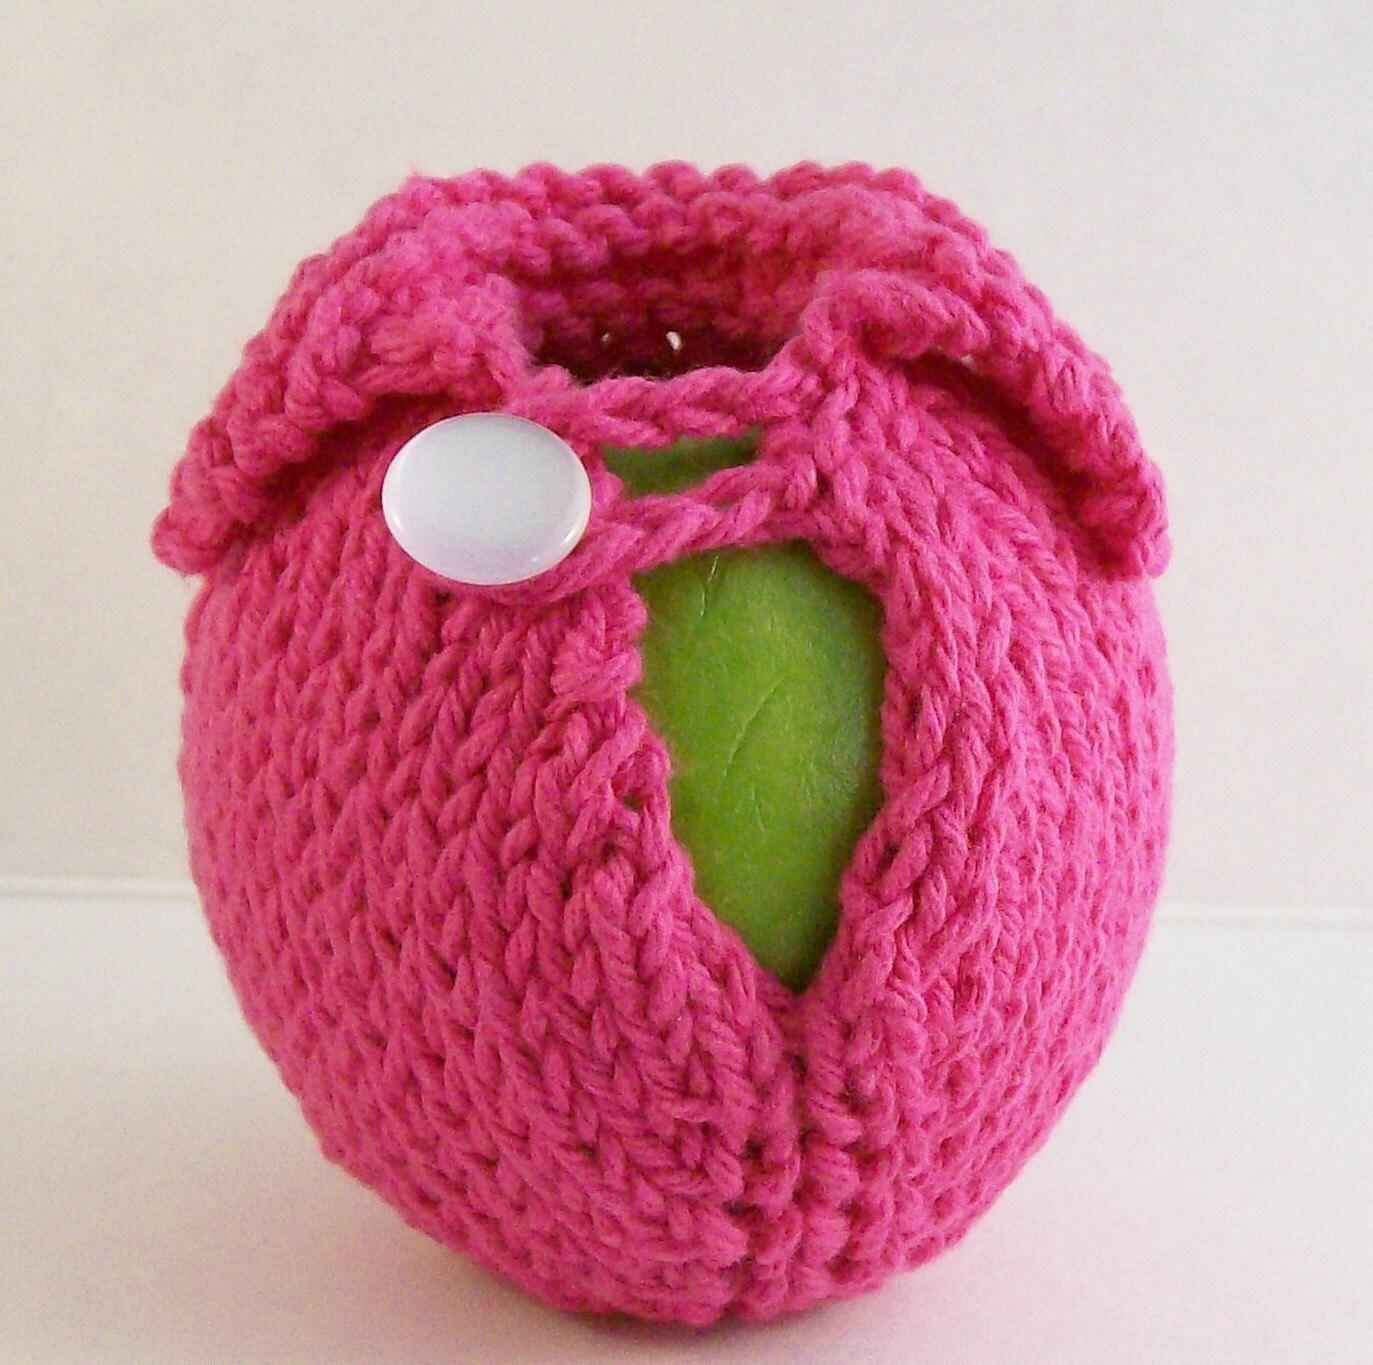 Apple Sweater - Handknit - Hot Hot Pink